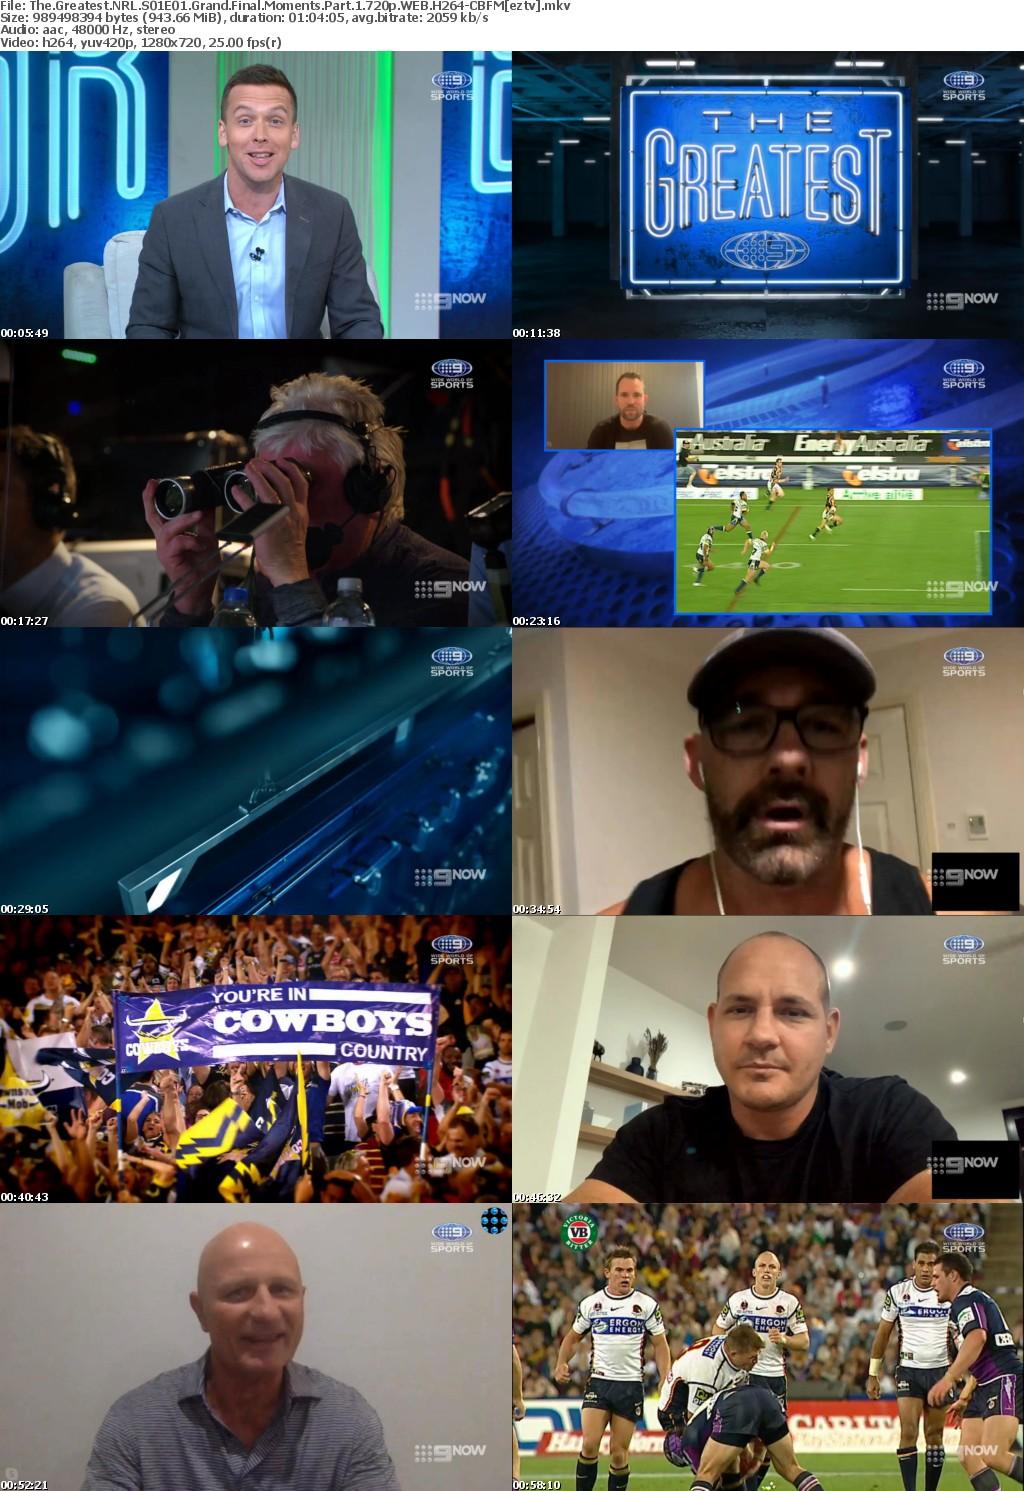 The Greatest NRL S01E01 Grand Final Moments Part 1 720p WEB H264-CBFM